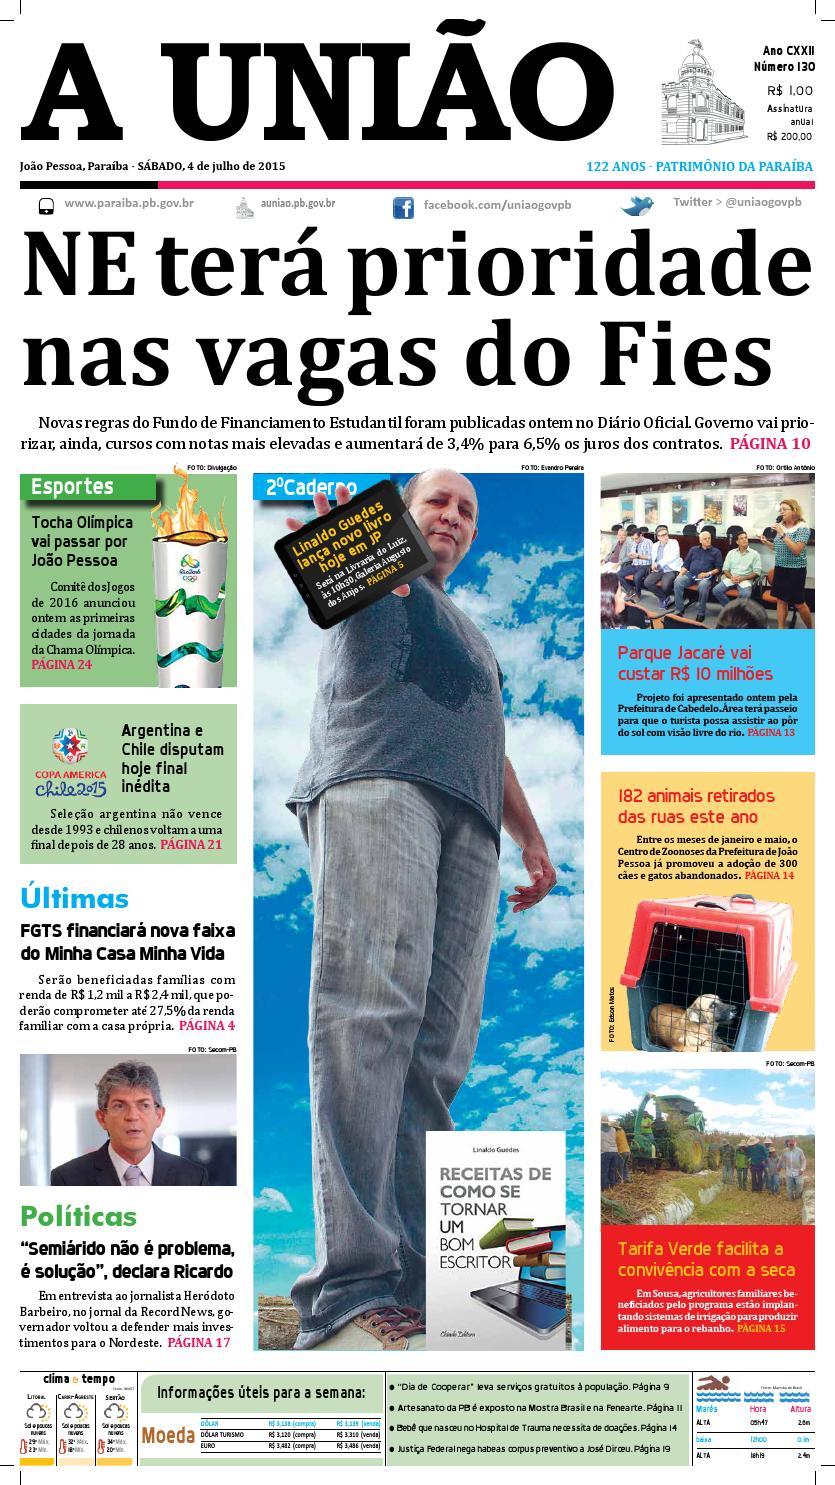 Jornal A União - 04 07 2015 by Jornal A União - issuu 5f1350b8912fd